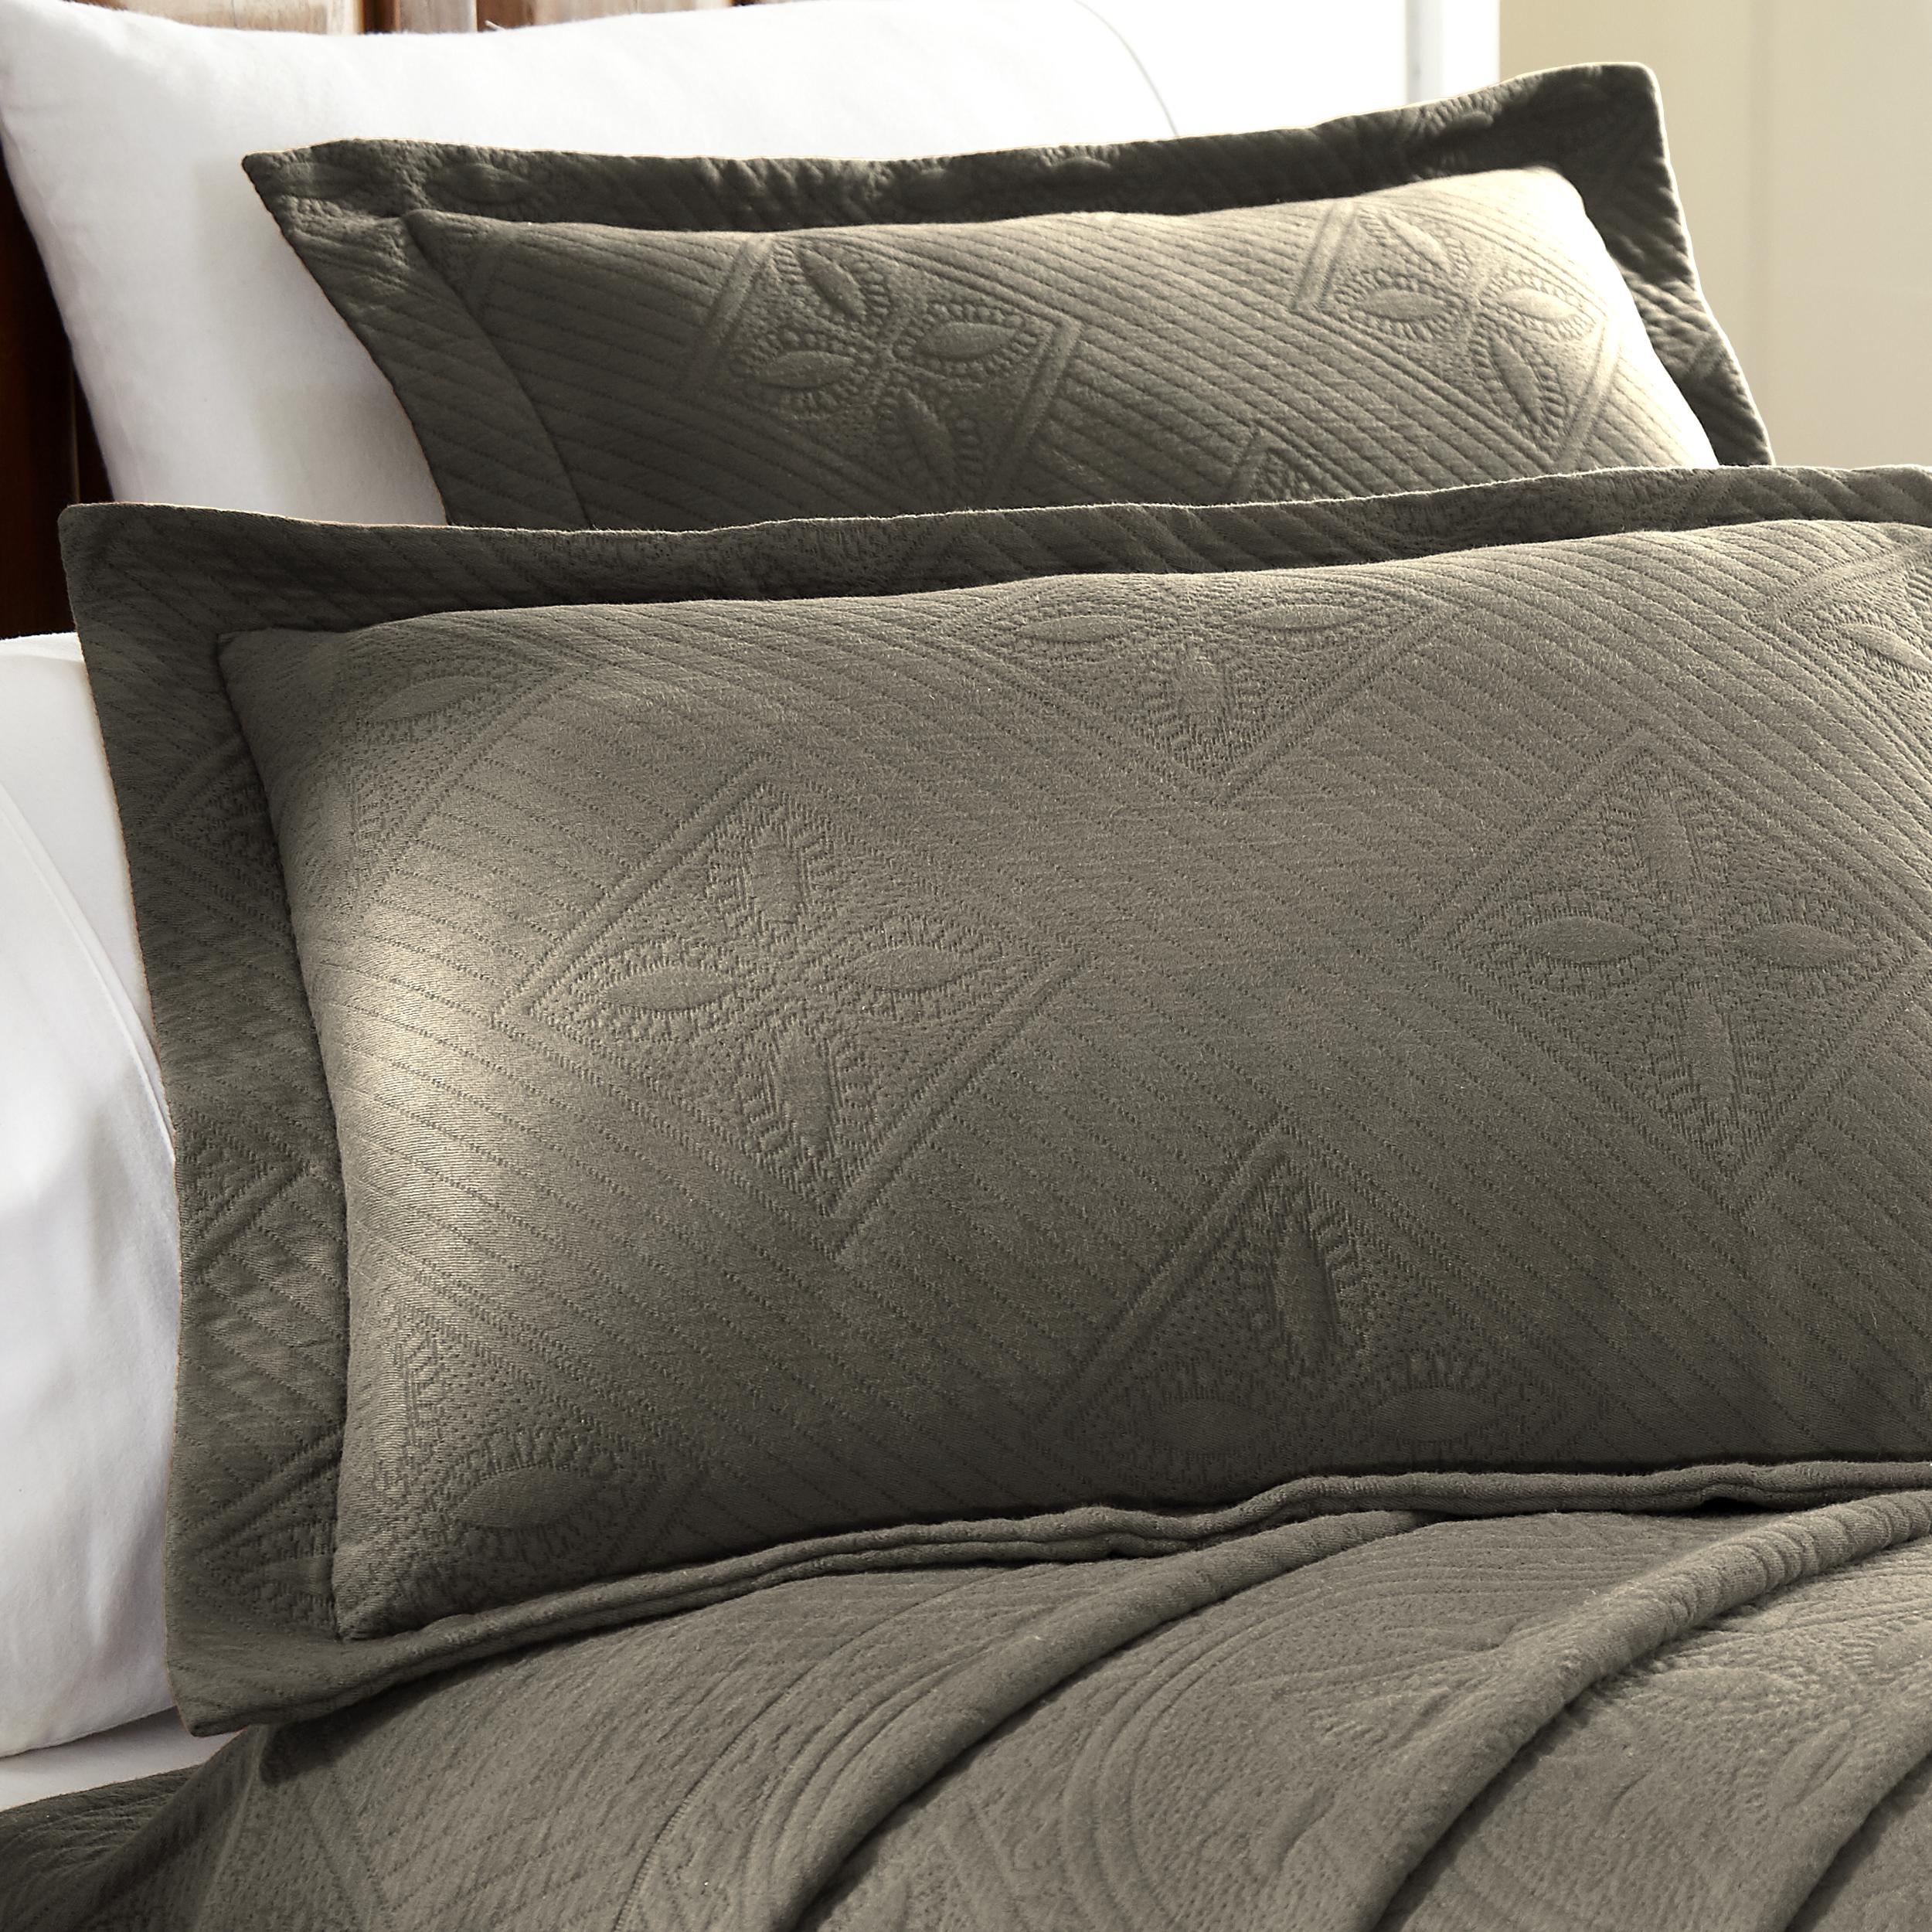 Celtic-Circle-Cotton-Jacquard-Matelasse-Scalloped-Bedspread-Set thumbnail 15